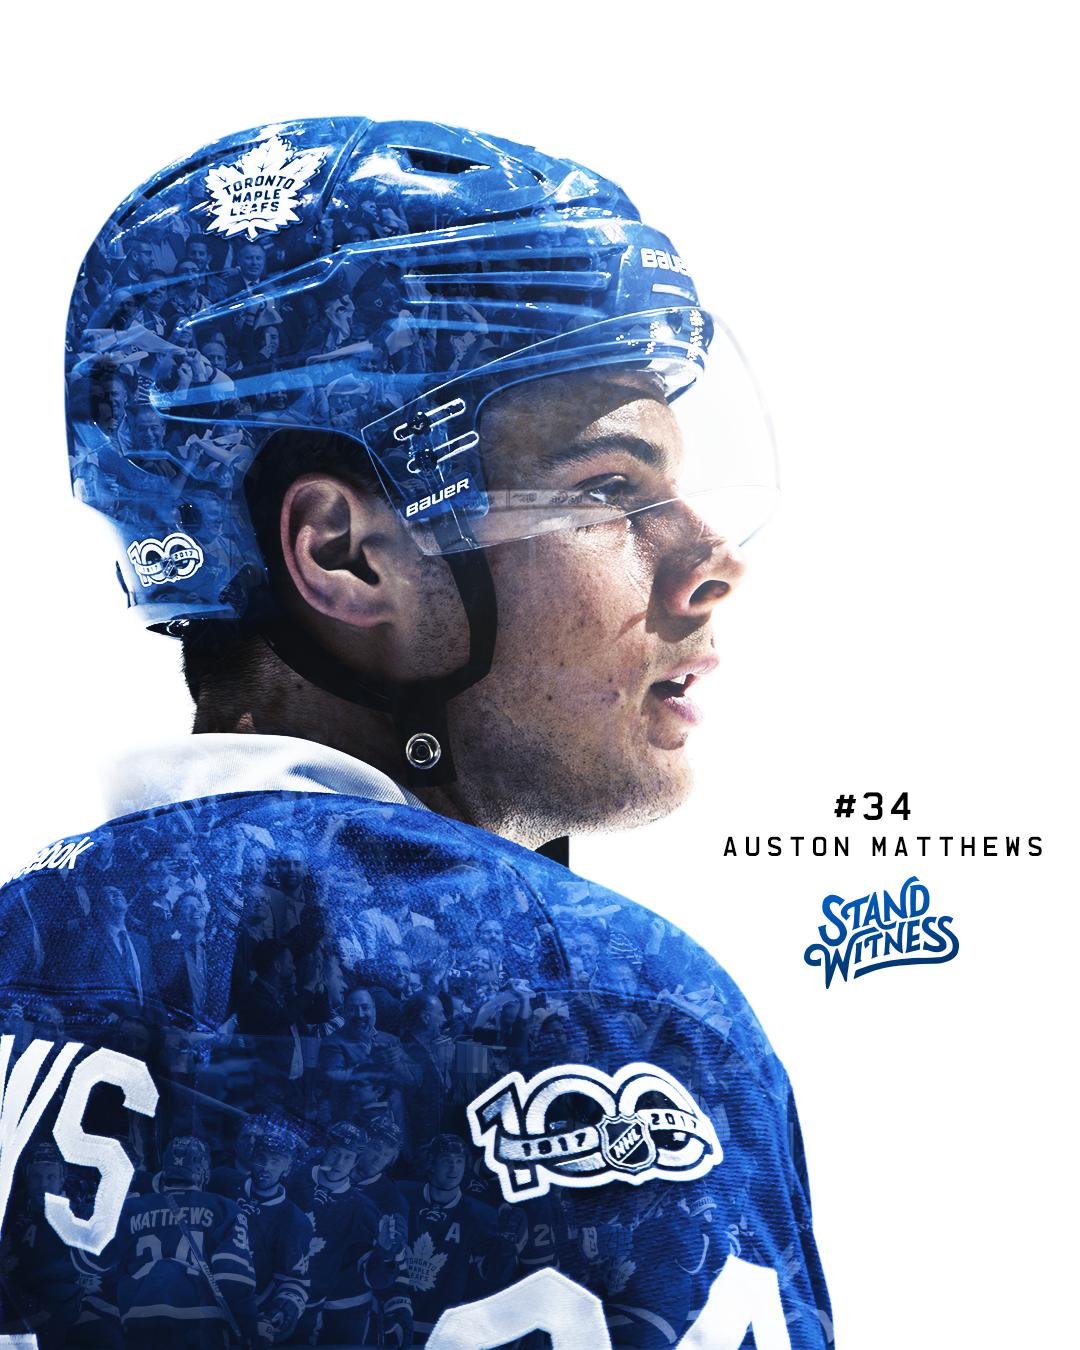 Auston Matthews Toronto Maple Leafs Wallpaper Maple Leafs Wallpaper Toronto Maple Leafs Hockey